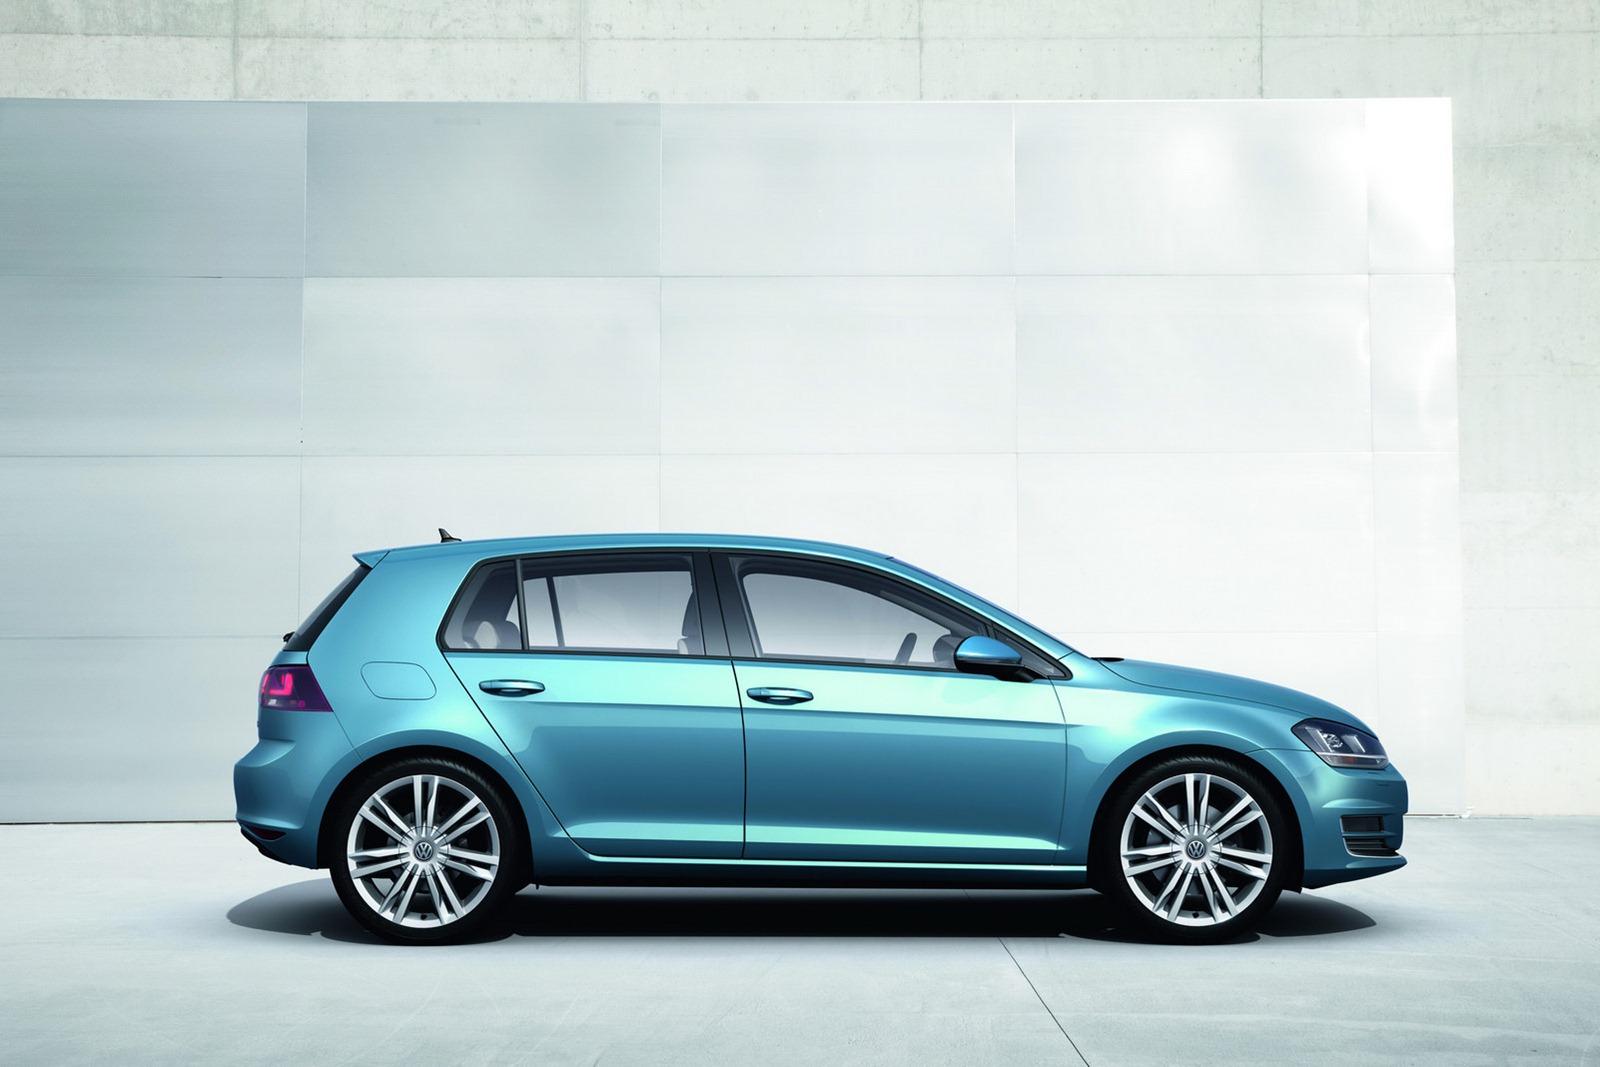 Golf R Vs Gti >> Volkswagen Cars - News: 2013 Mk7 Golf Revealed